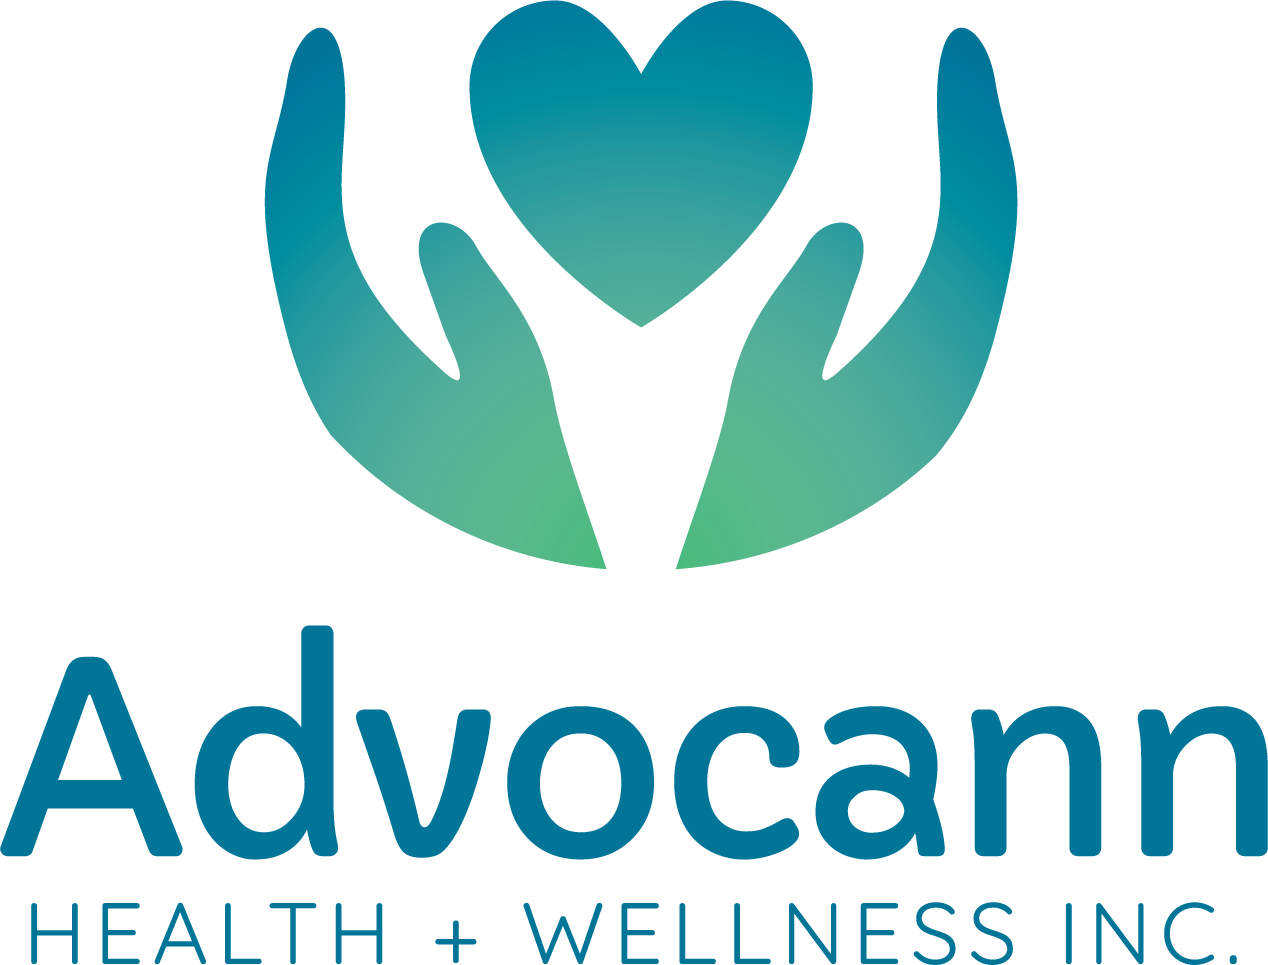 Advocann Health + Wellness Inc.